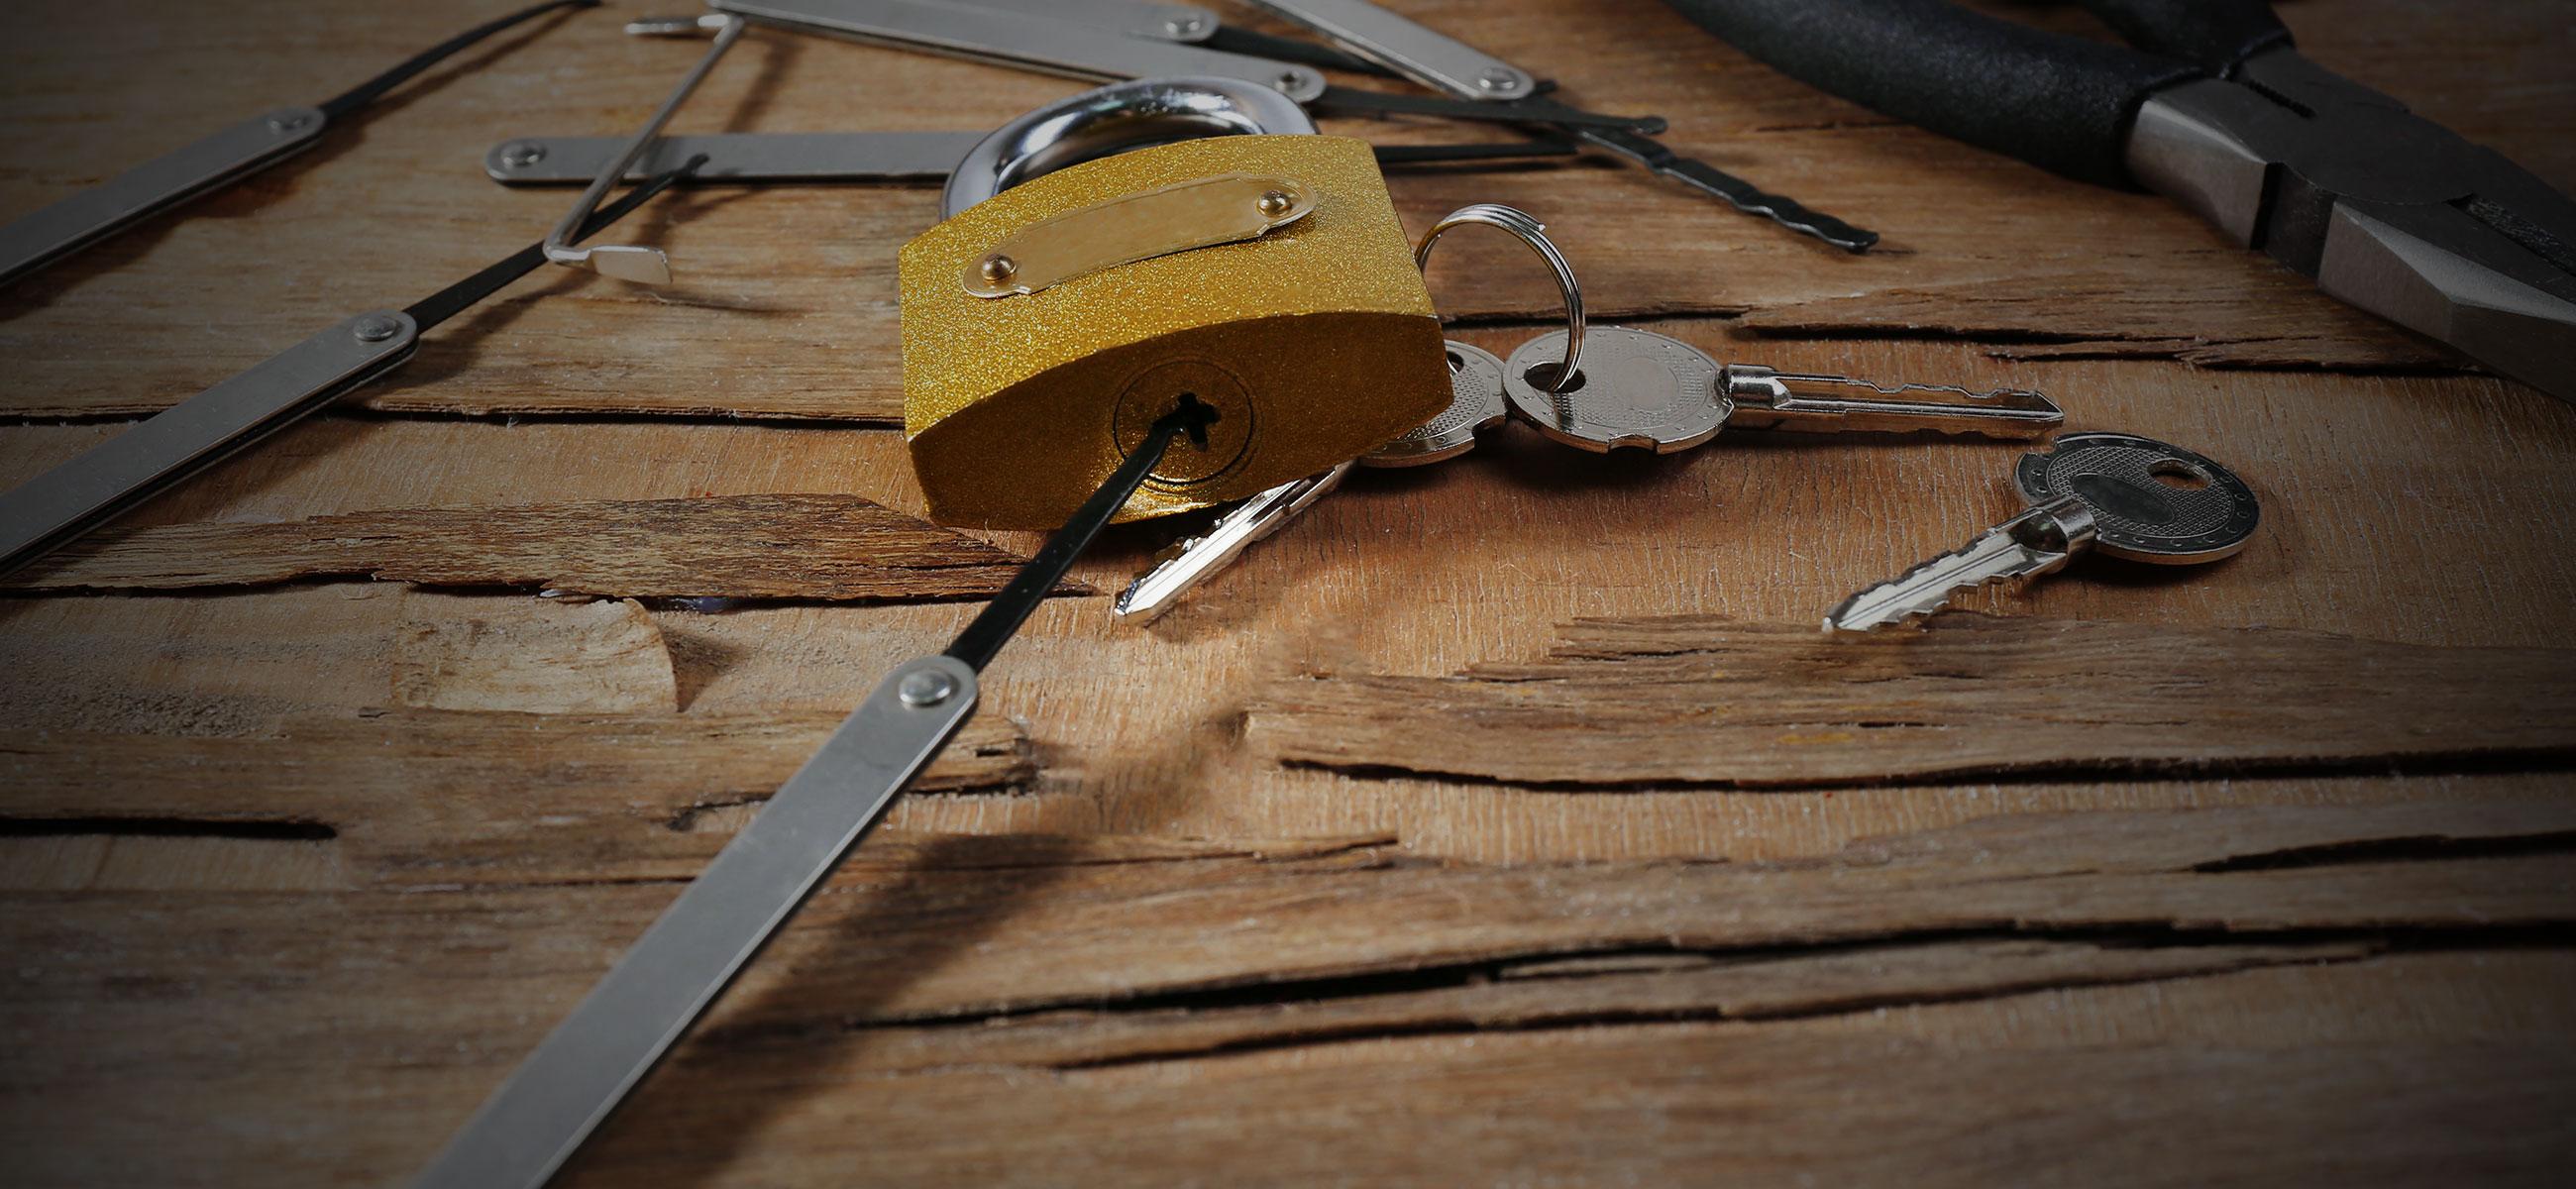 northumberland_locksmith-bedlington_locksmith-locks